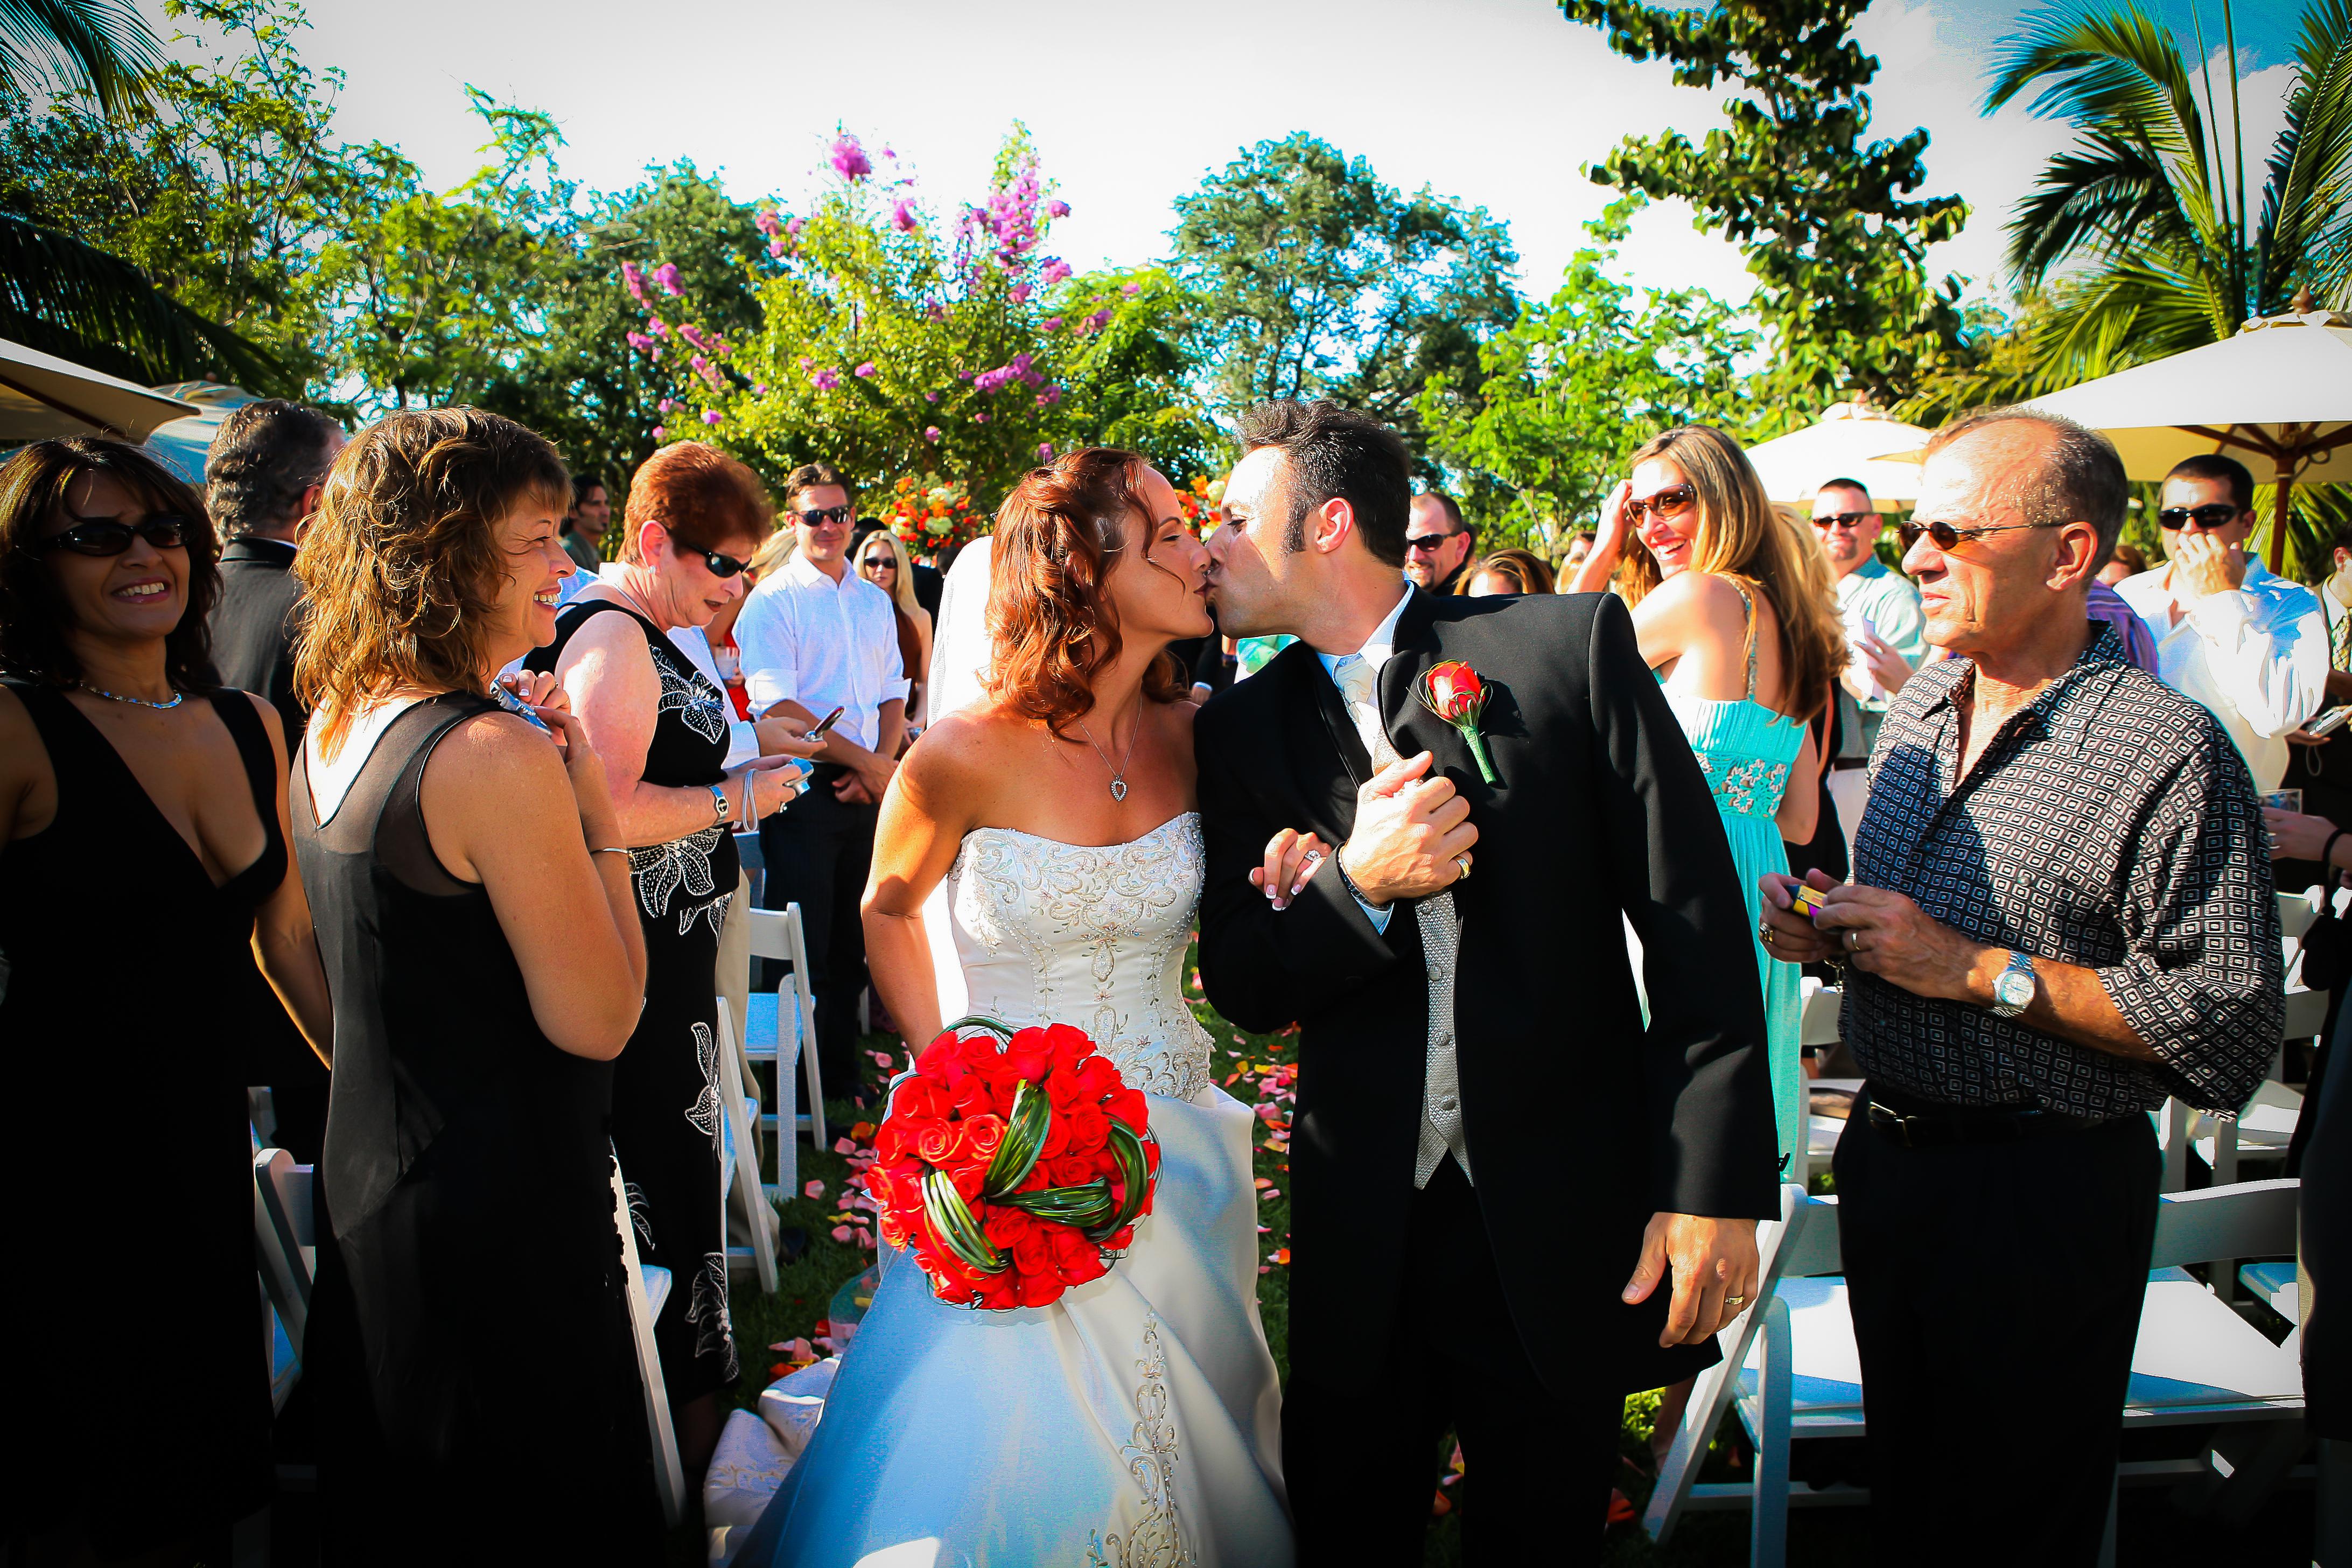 vito wedding-from-breeze.oct-06 168.jpg